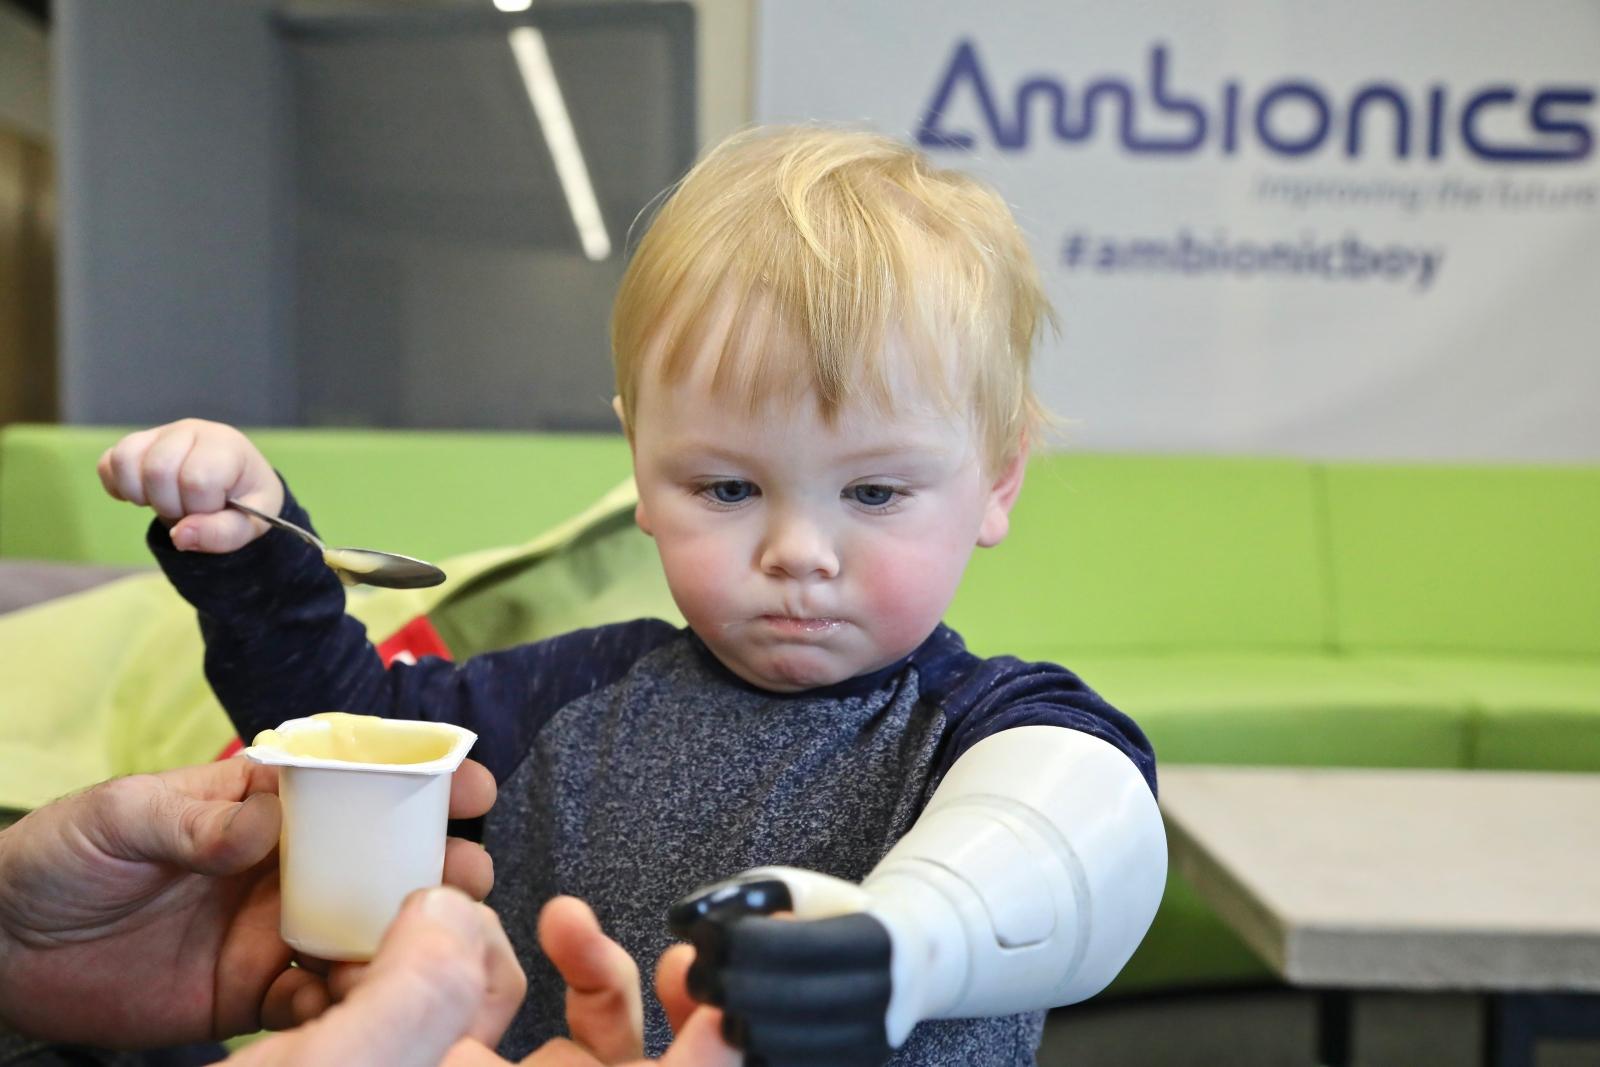 The Ambionics prosthetic arm for infants